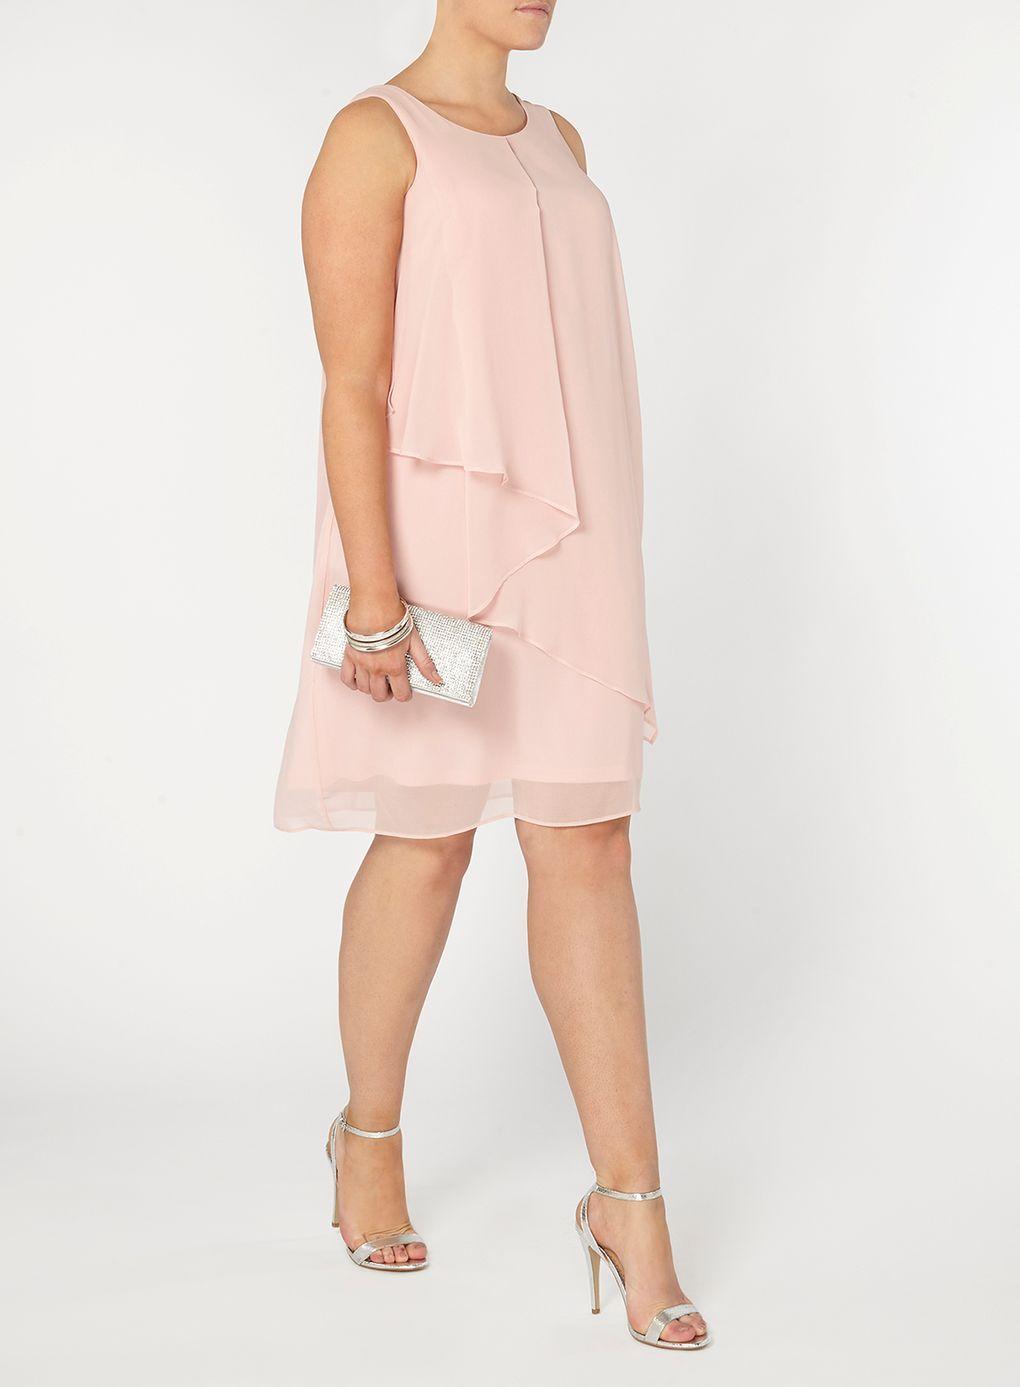 Plus Size Fashion  Blush Pink Frill Front Dress plus size